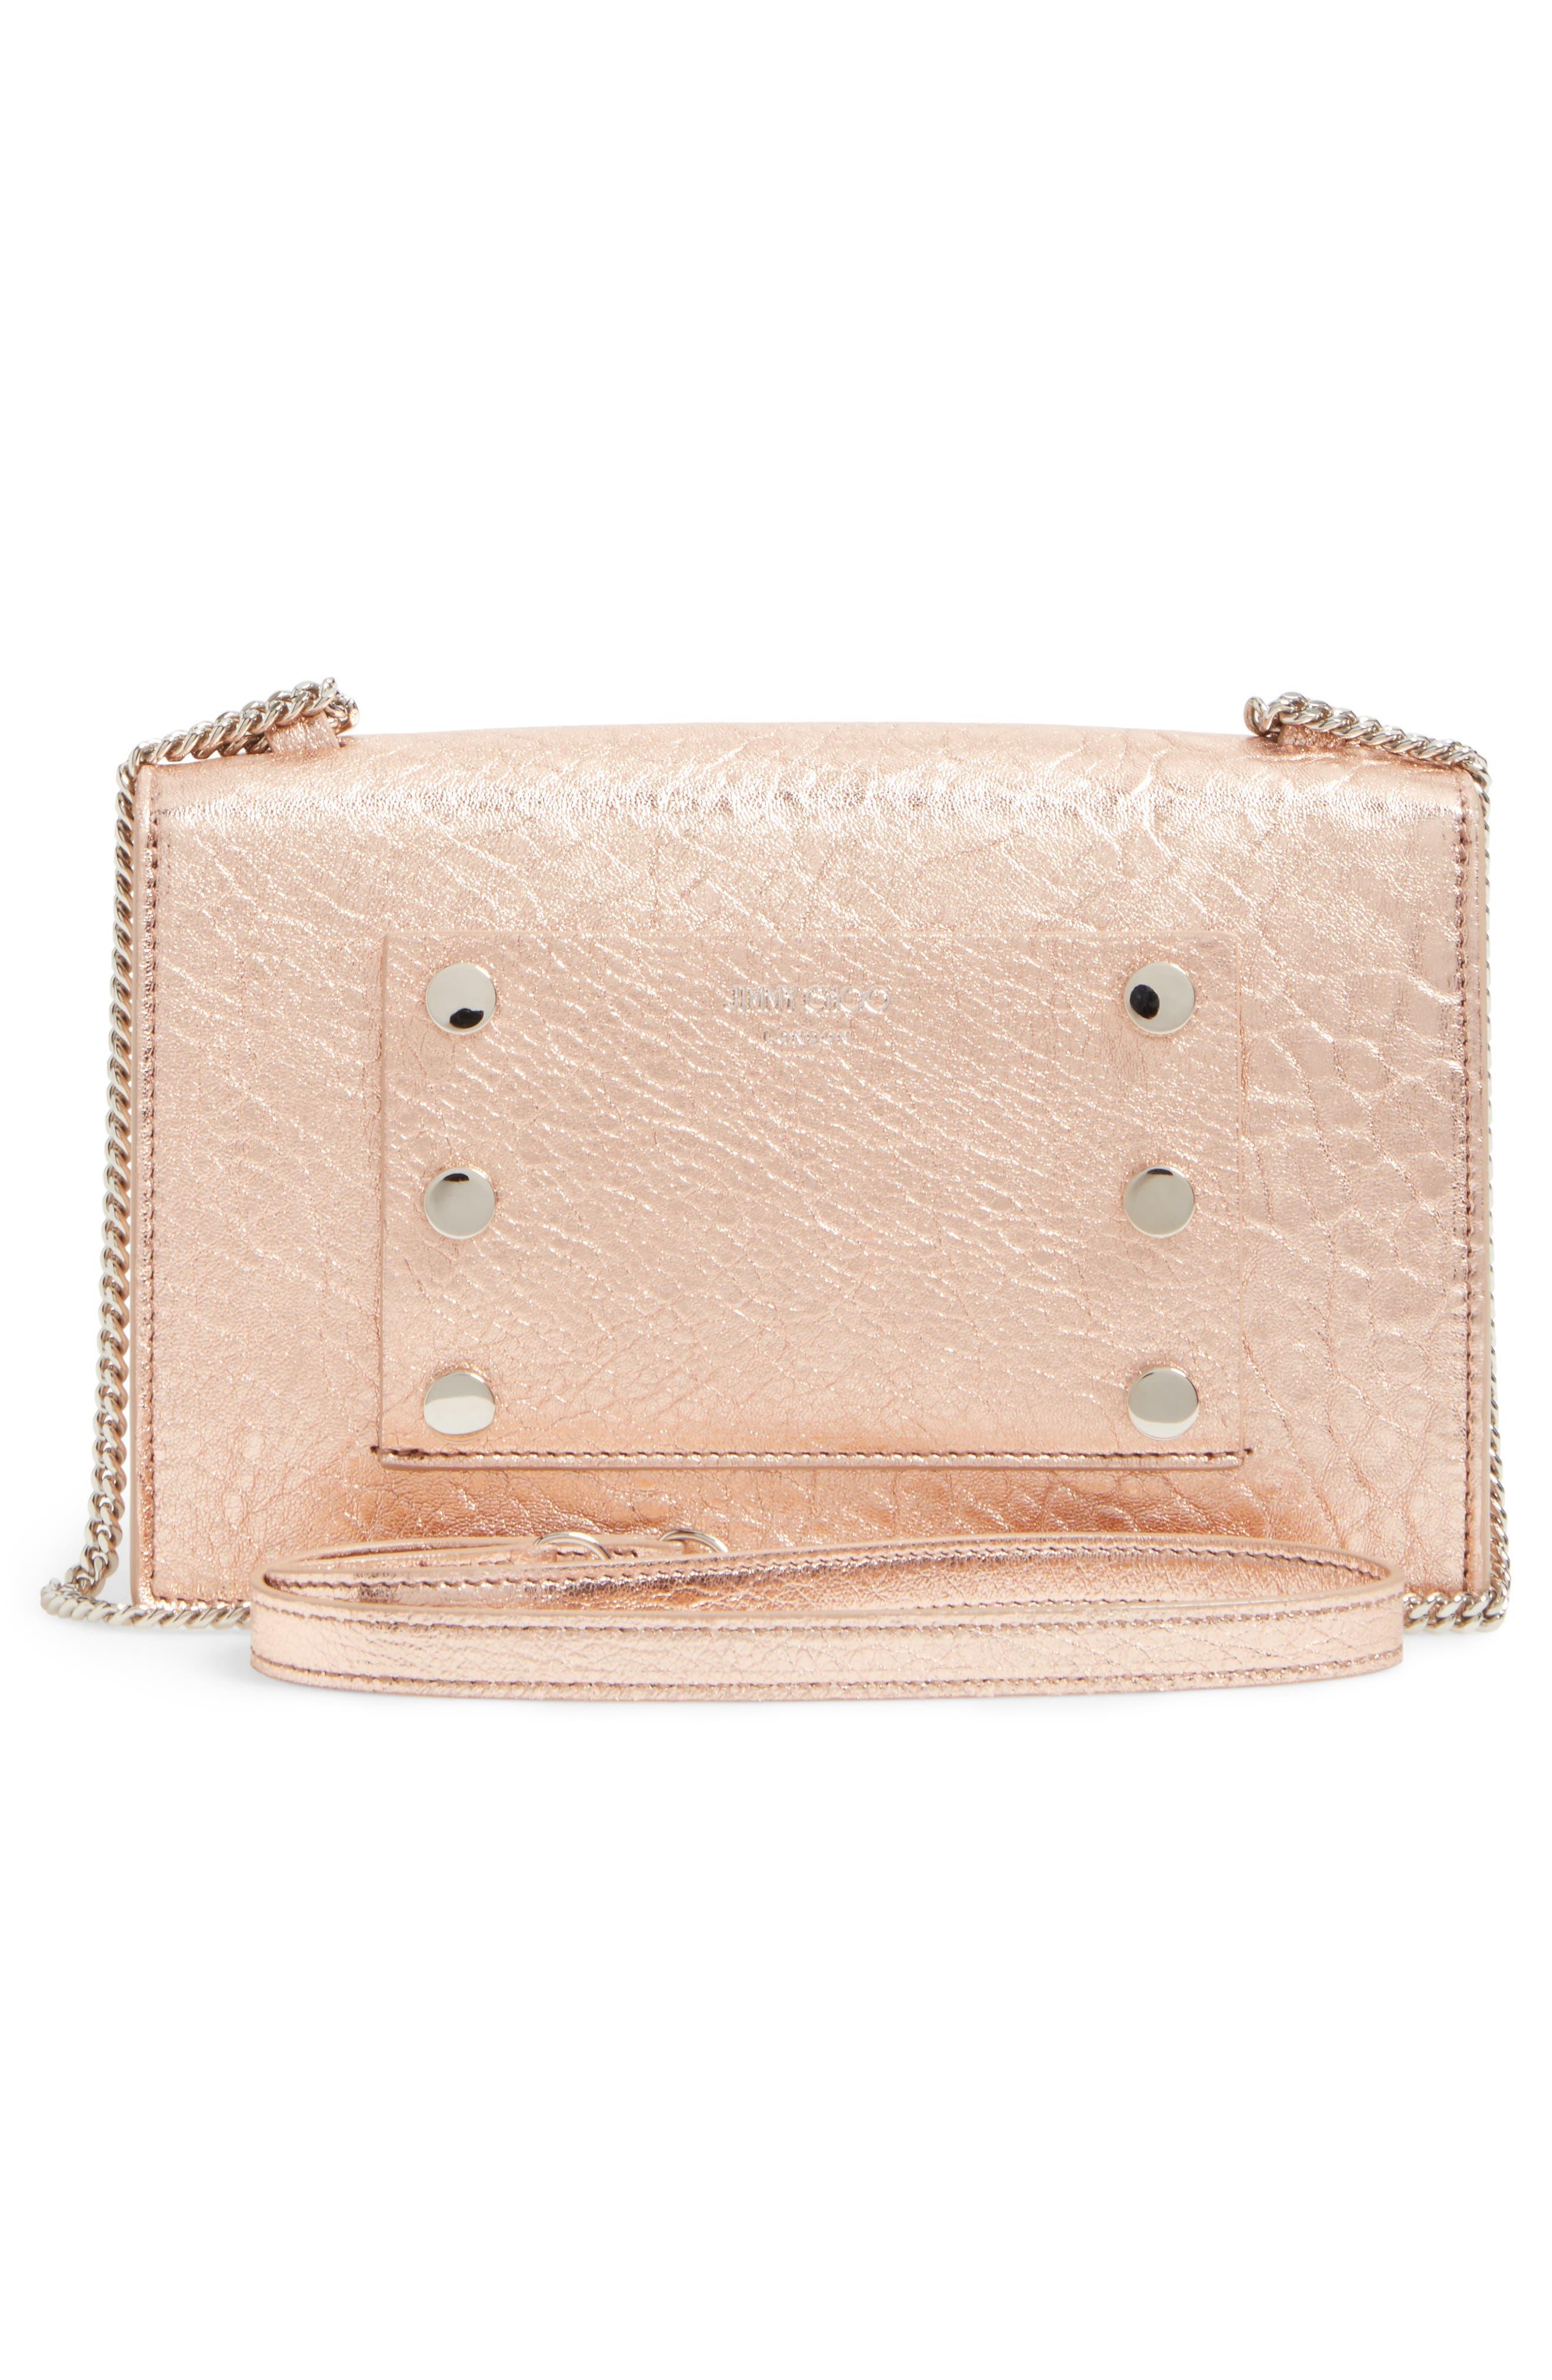 Alternate Image 3  - Jimmy Choo Leila Grainy Lambskin Leather Crossbody Bag